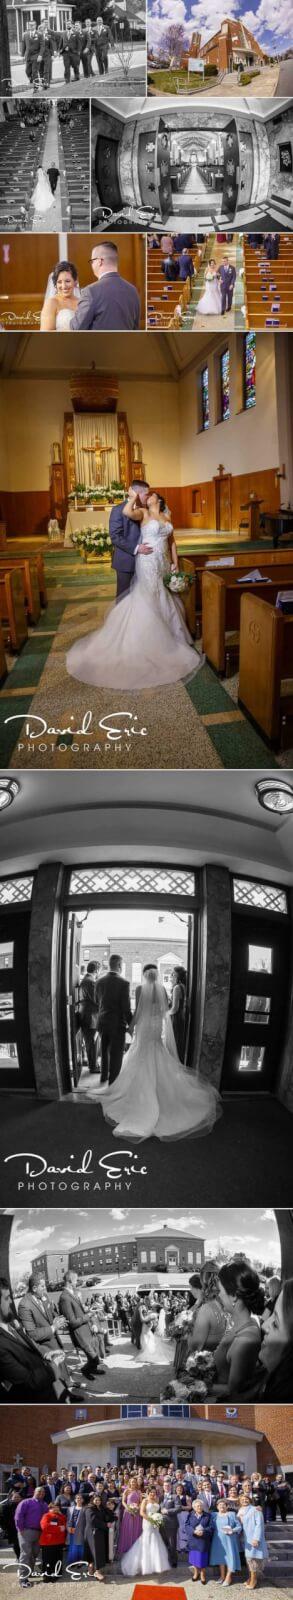 Park Savoy Wedding wedding ceremony at St Ann's